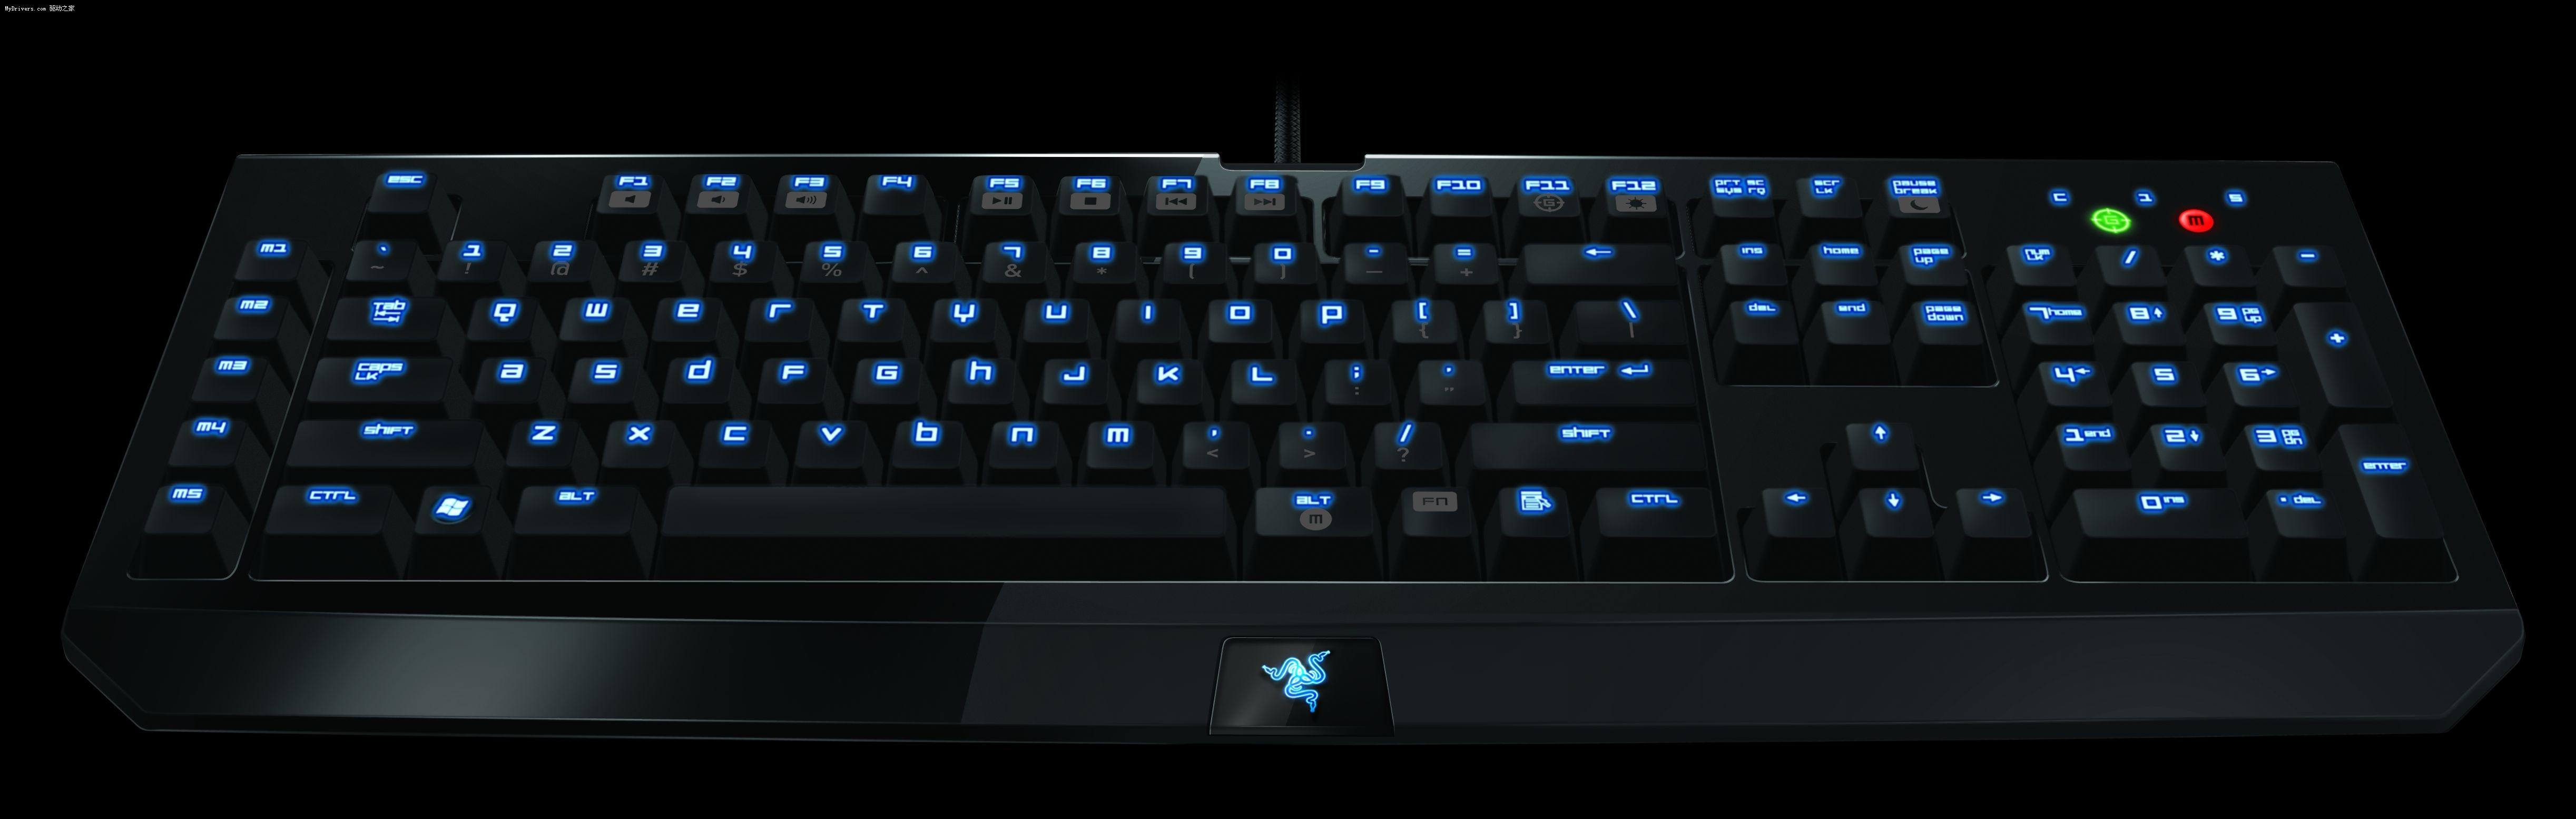 Razer BlackWidow黑寡妇键盘特性: - 机械按键结构,触发速度更快、使用寿命更长 - 完全可编程按键,5个具有飞敏宏录制功能的额外游戏按键 - 10个可自定义配置文件,带有飞敏切换功能 - 1000Hz Ultrapolling高速1ms响应时间 - 为游戏优化的按键矩阵,防止按键冲突 - 简单易用的多媒体按键 - 游戏模式(禁用Windows键) - 产品尺寸:475x171x30mm - 重量:1.